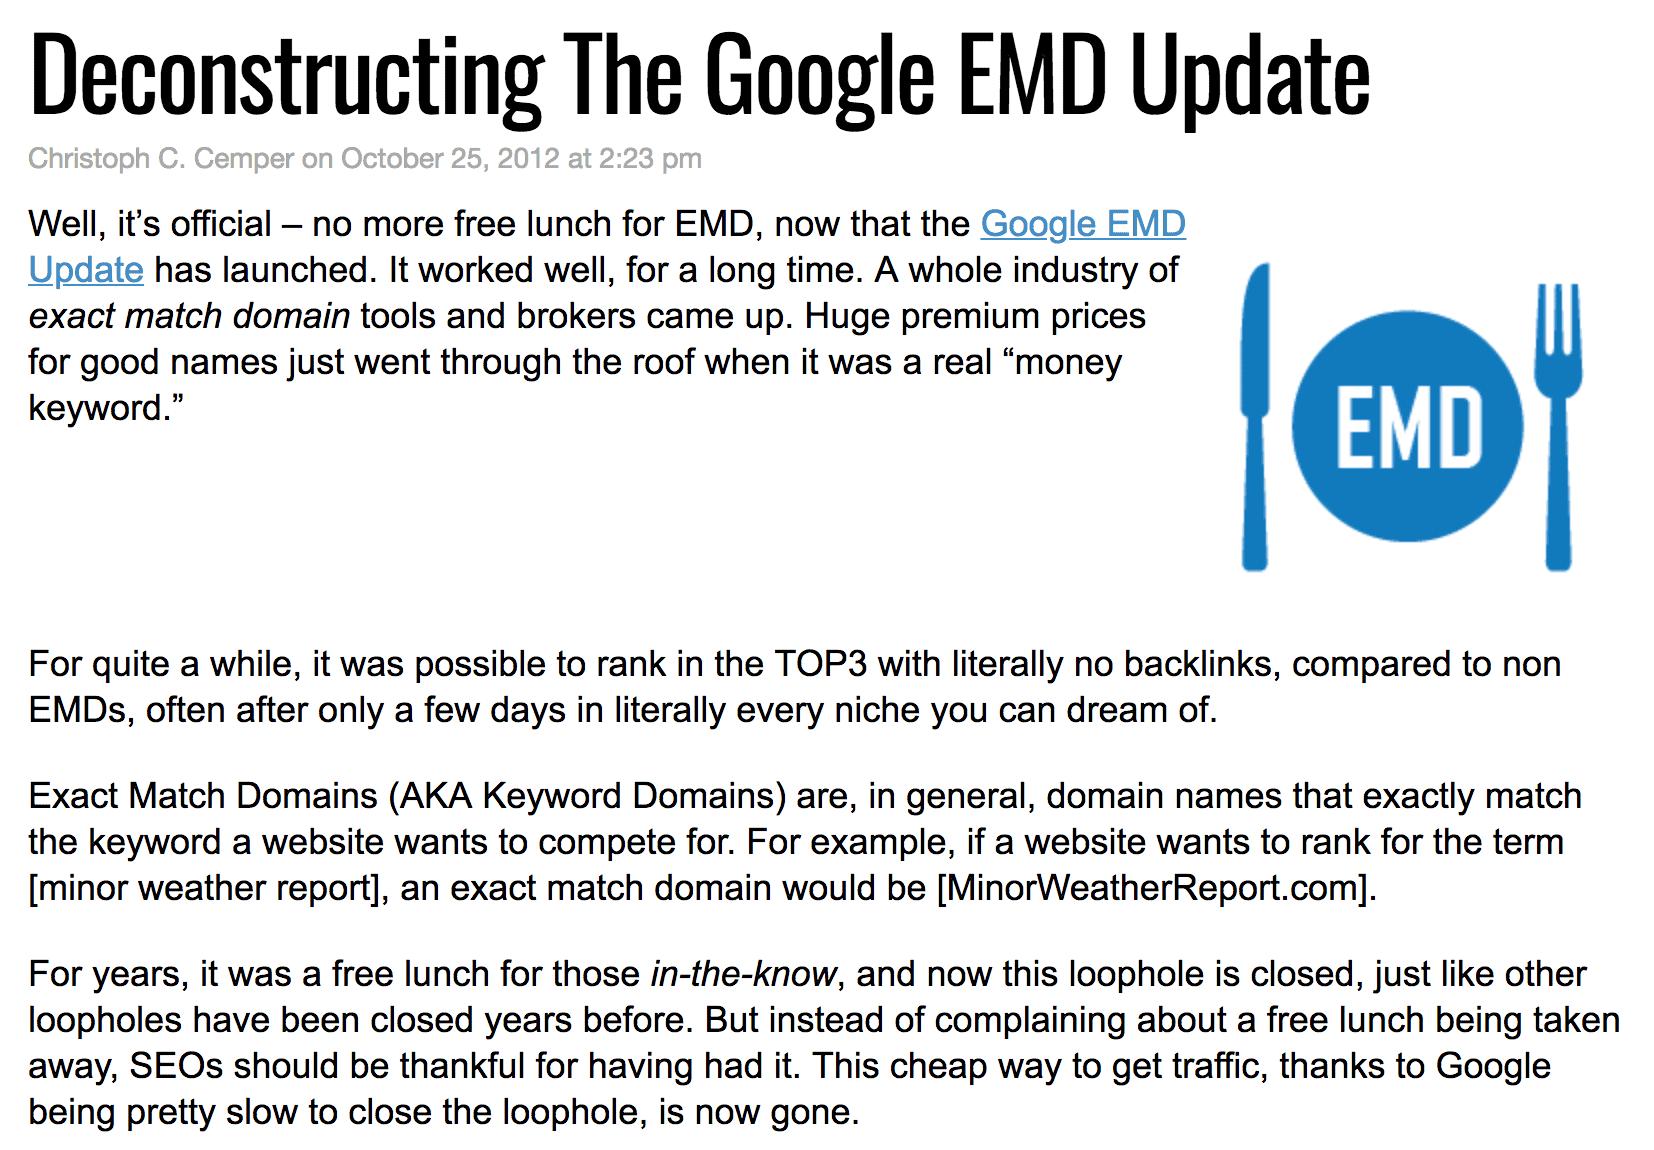 Google EMD update